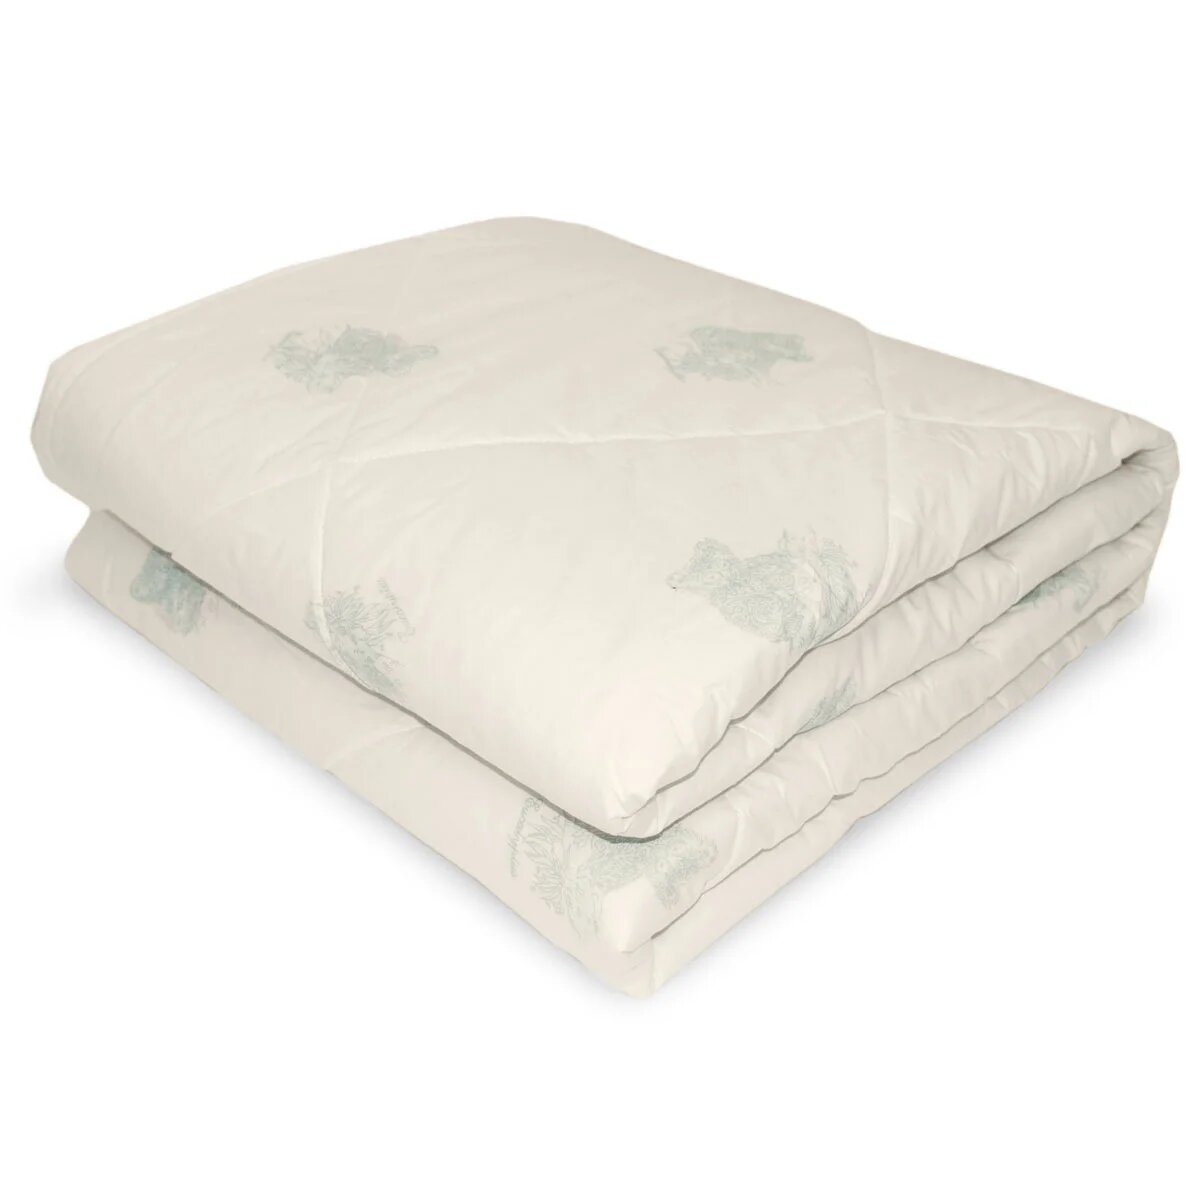 Одеяло CLASSIC by T 20.04.12.0070 Эвкалипт